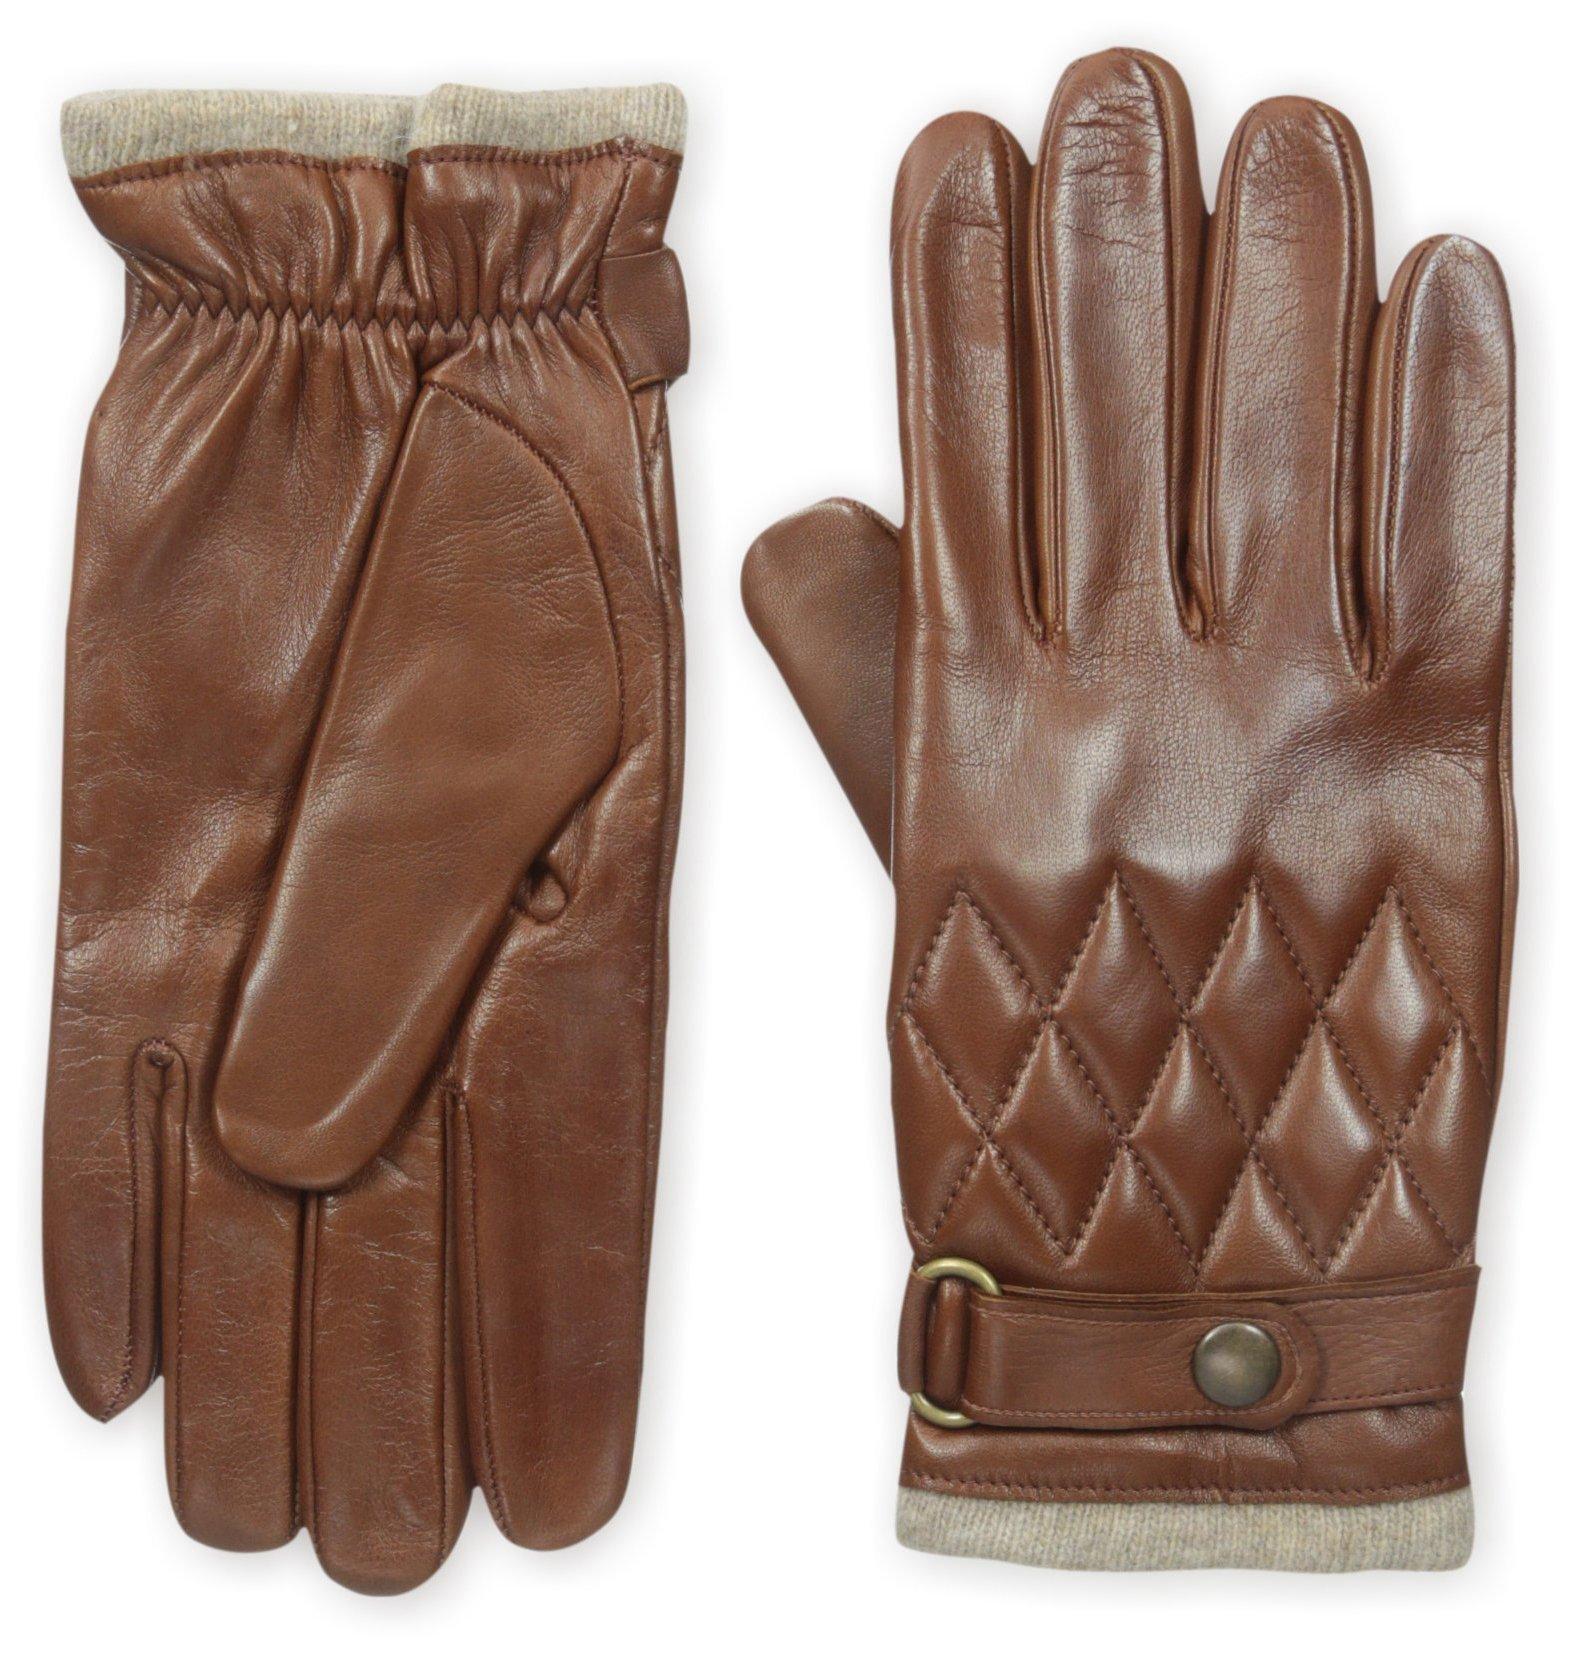 Franklin Tailored Men's Nappa Snap Closure Glove, Cognac, M